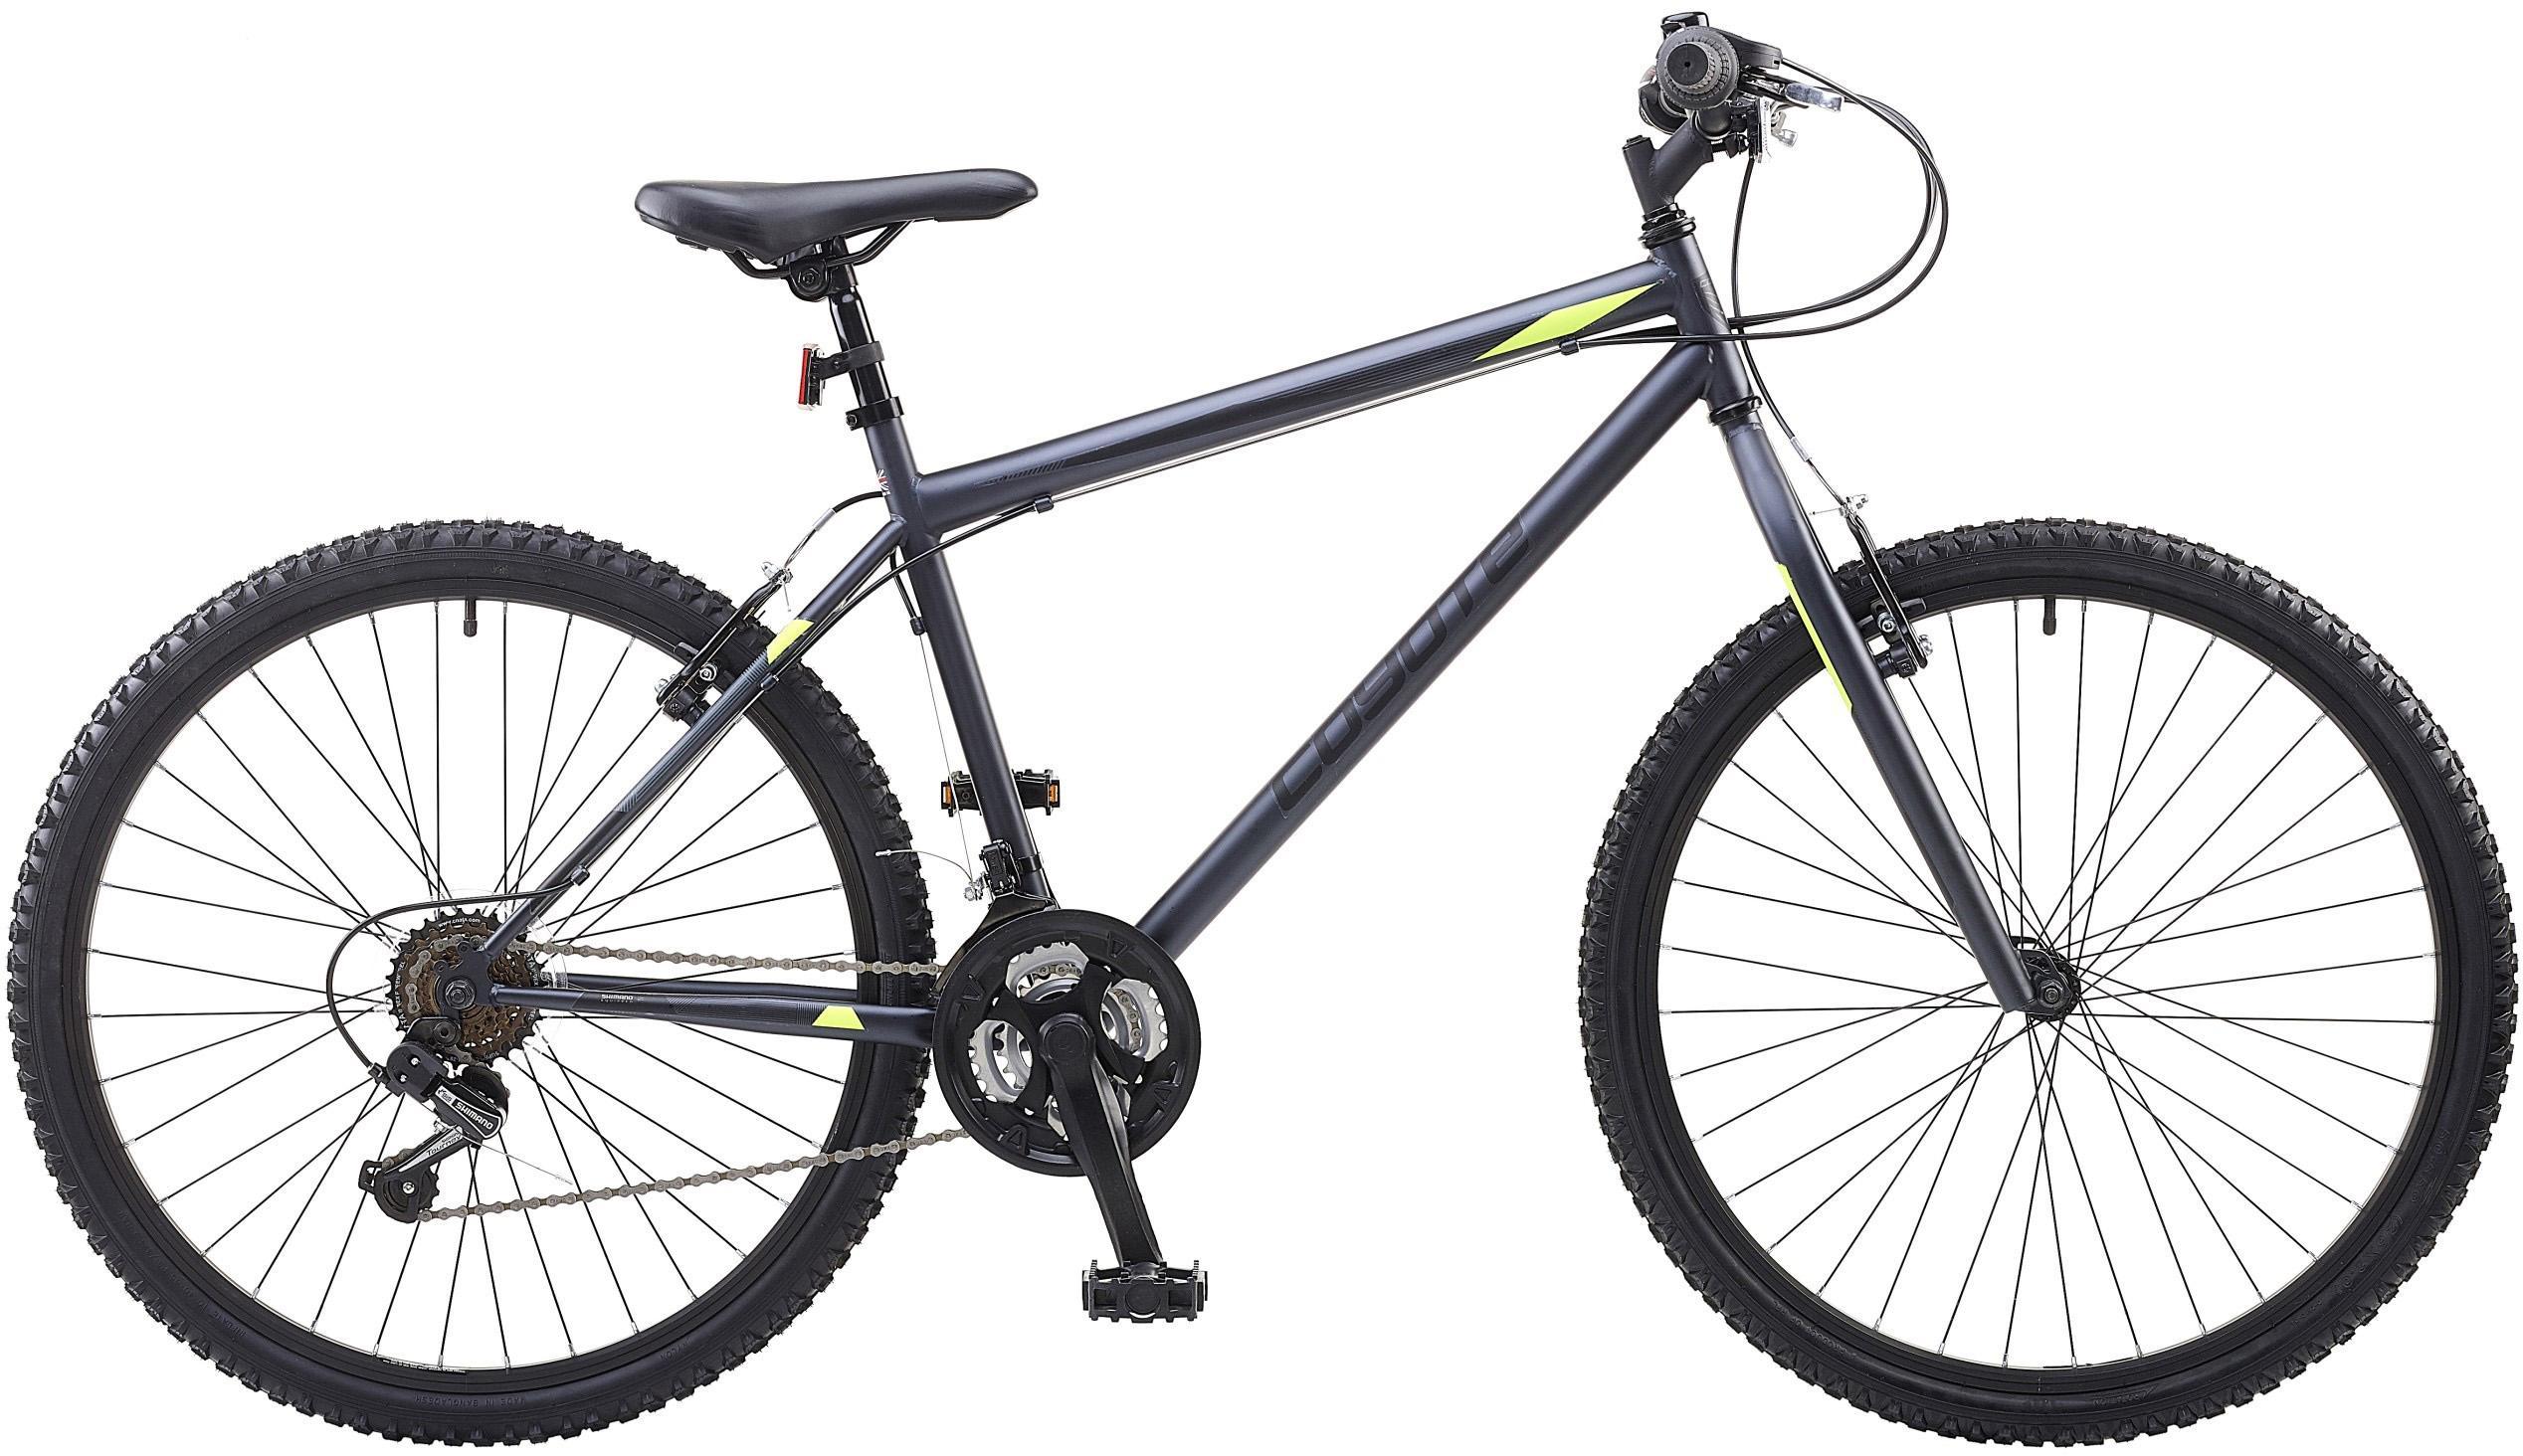 Coyote Element Xr Mens Mountain Bike - 16 Inch Frame